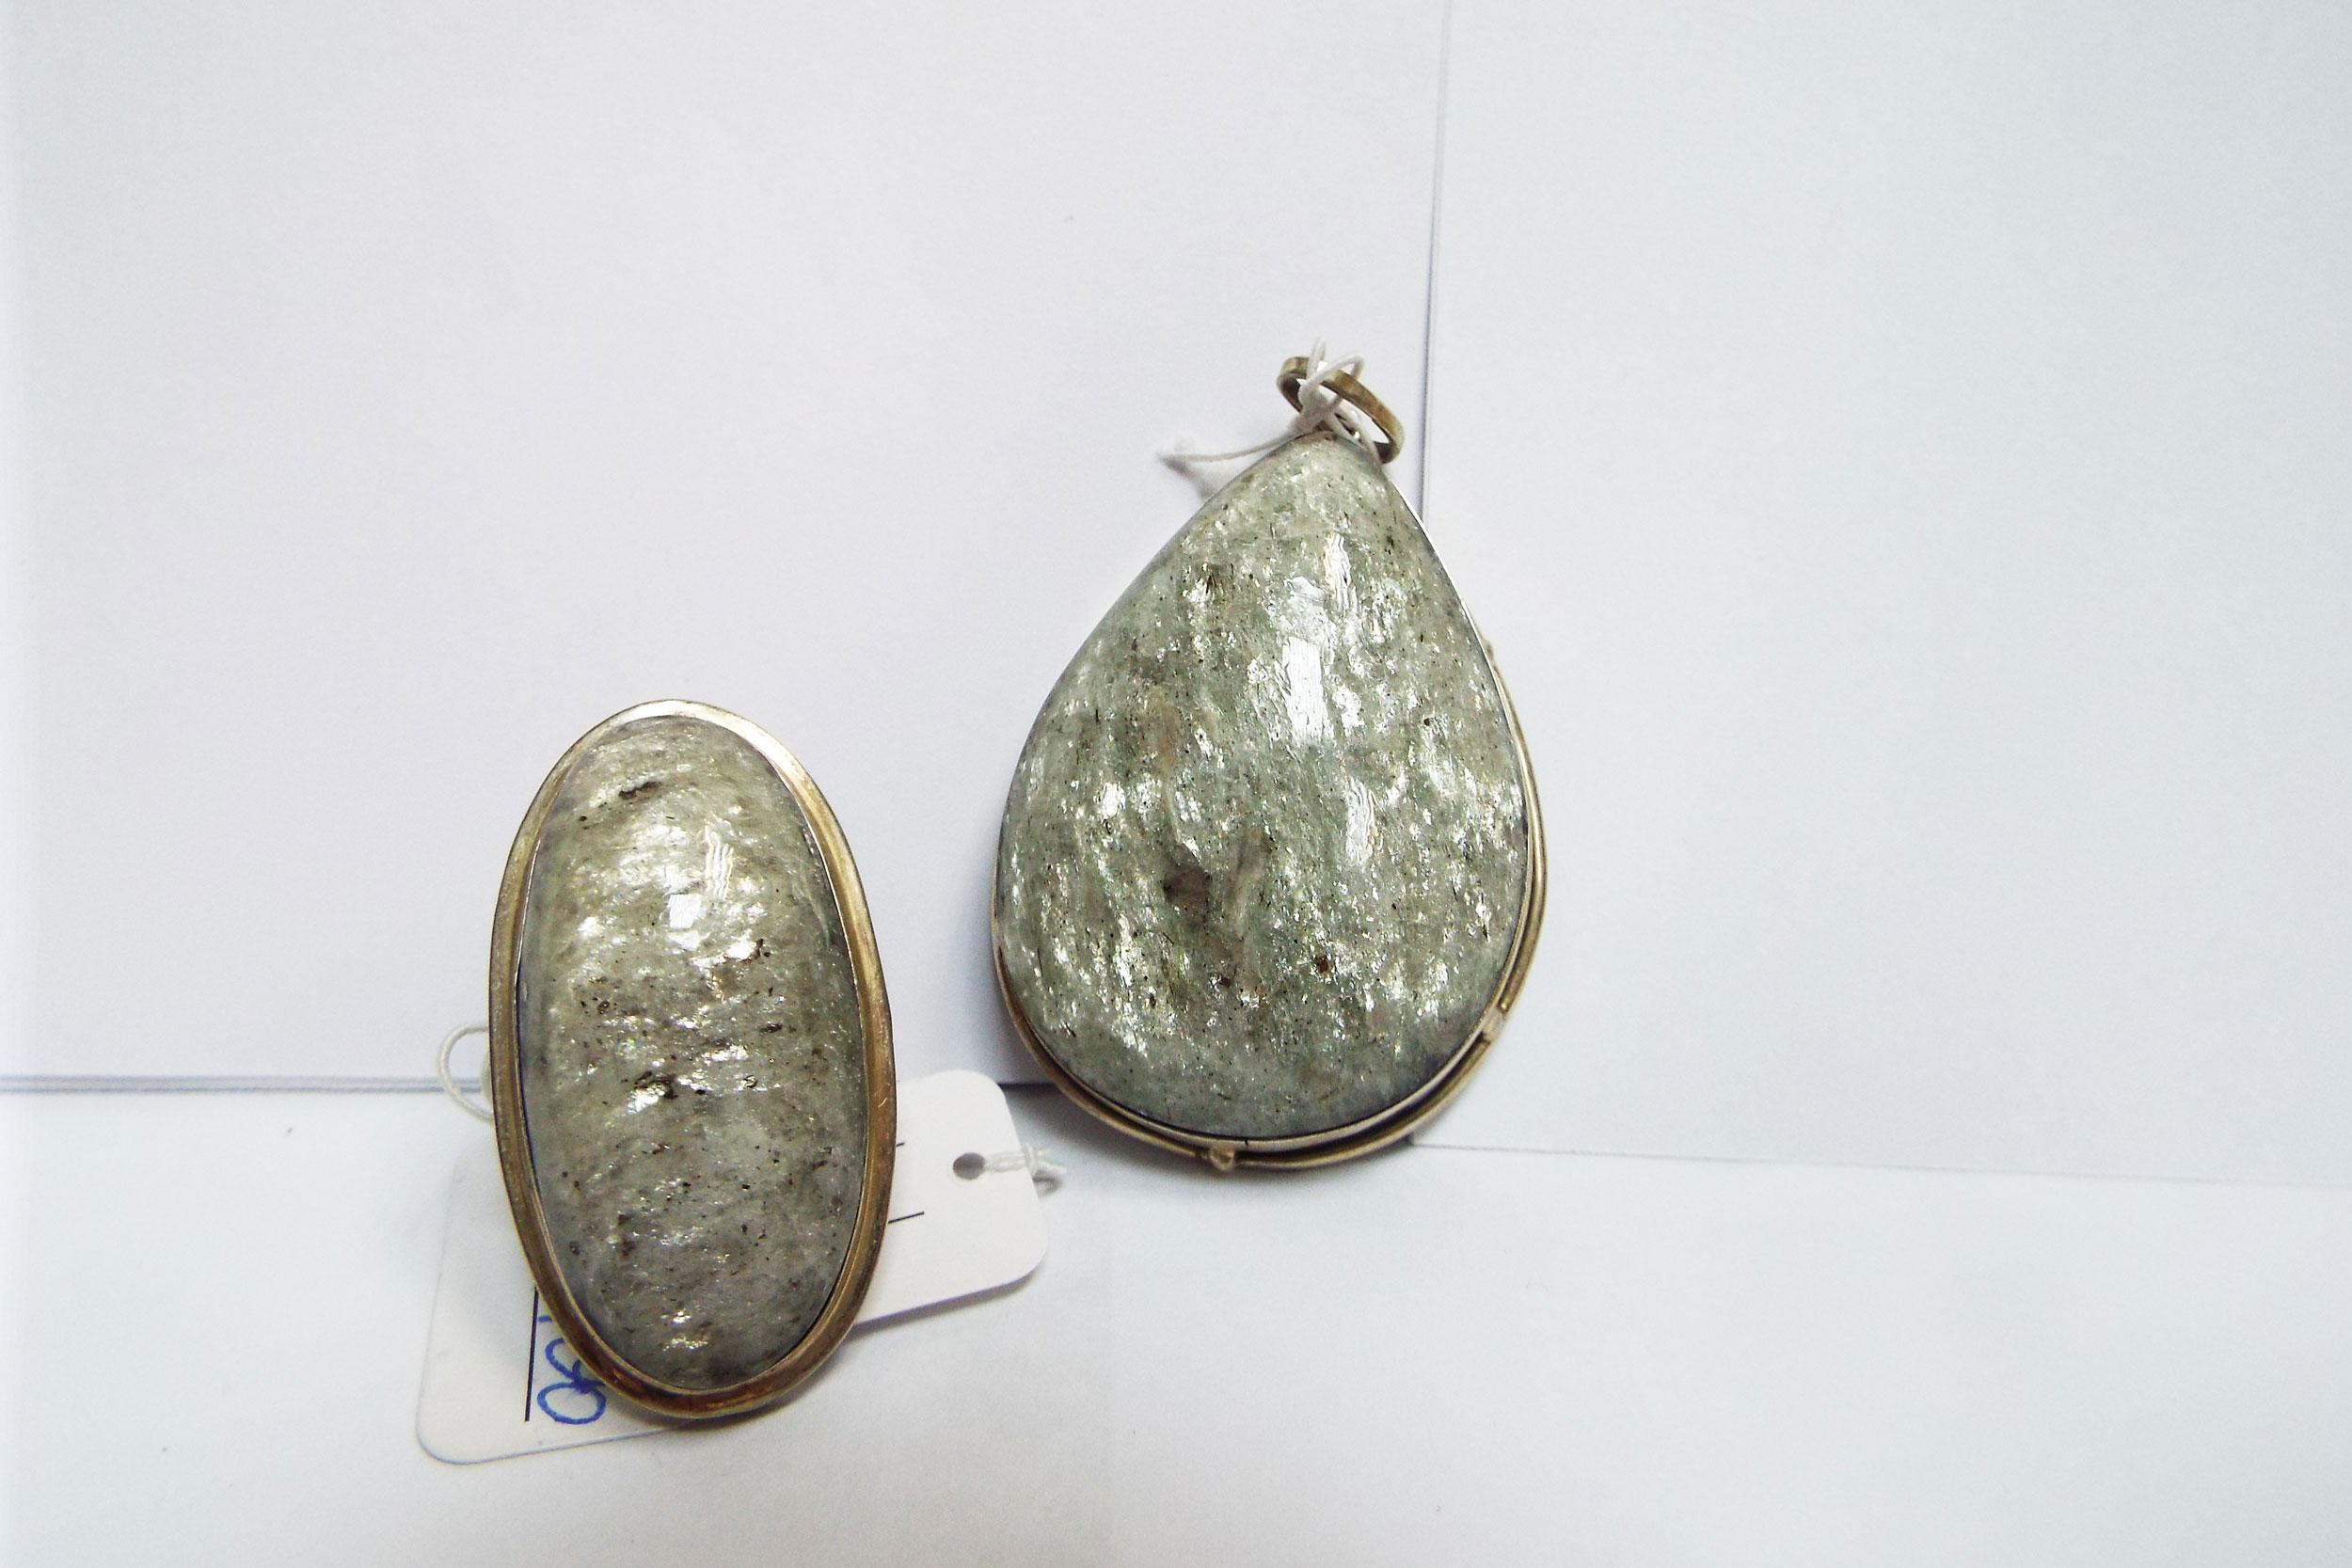 Подвеска и кольцо из мусковита